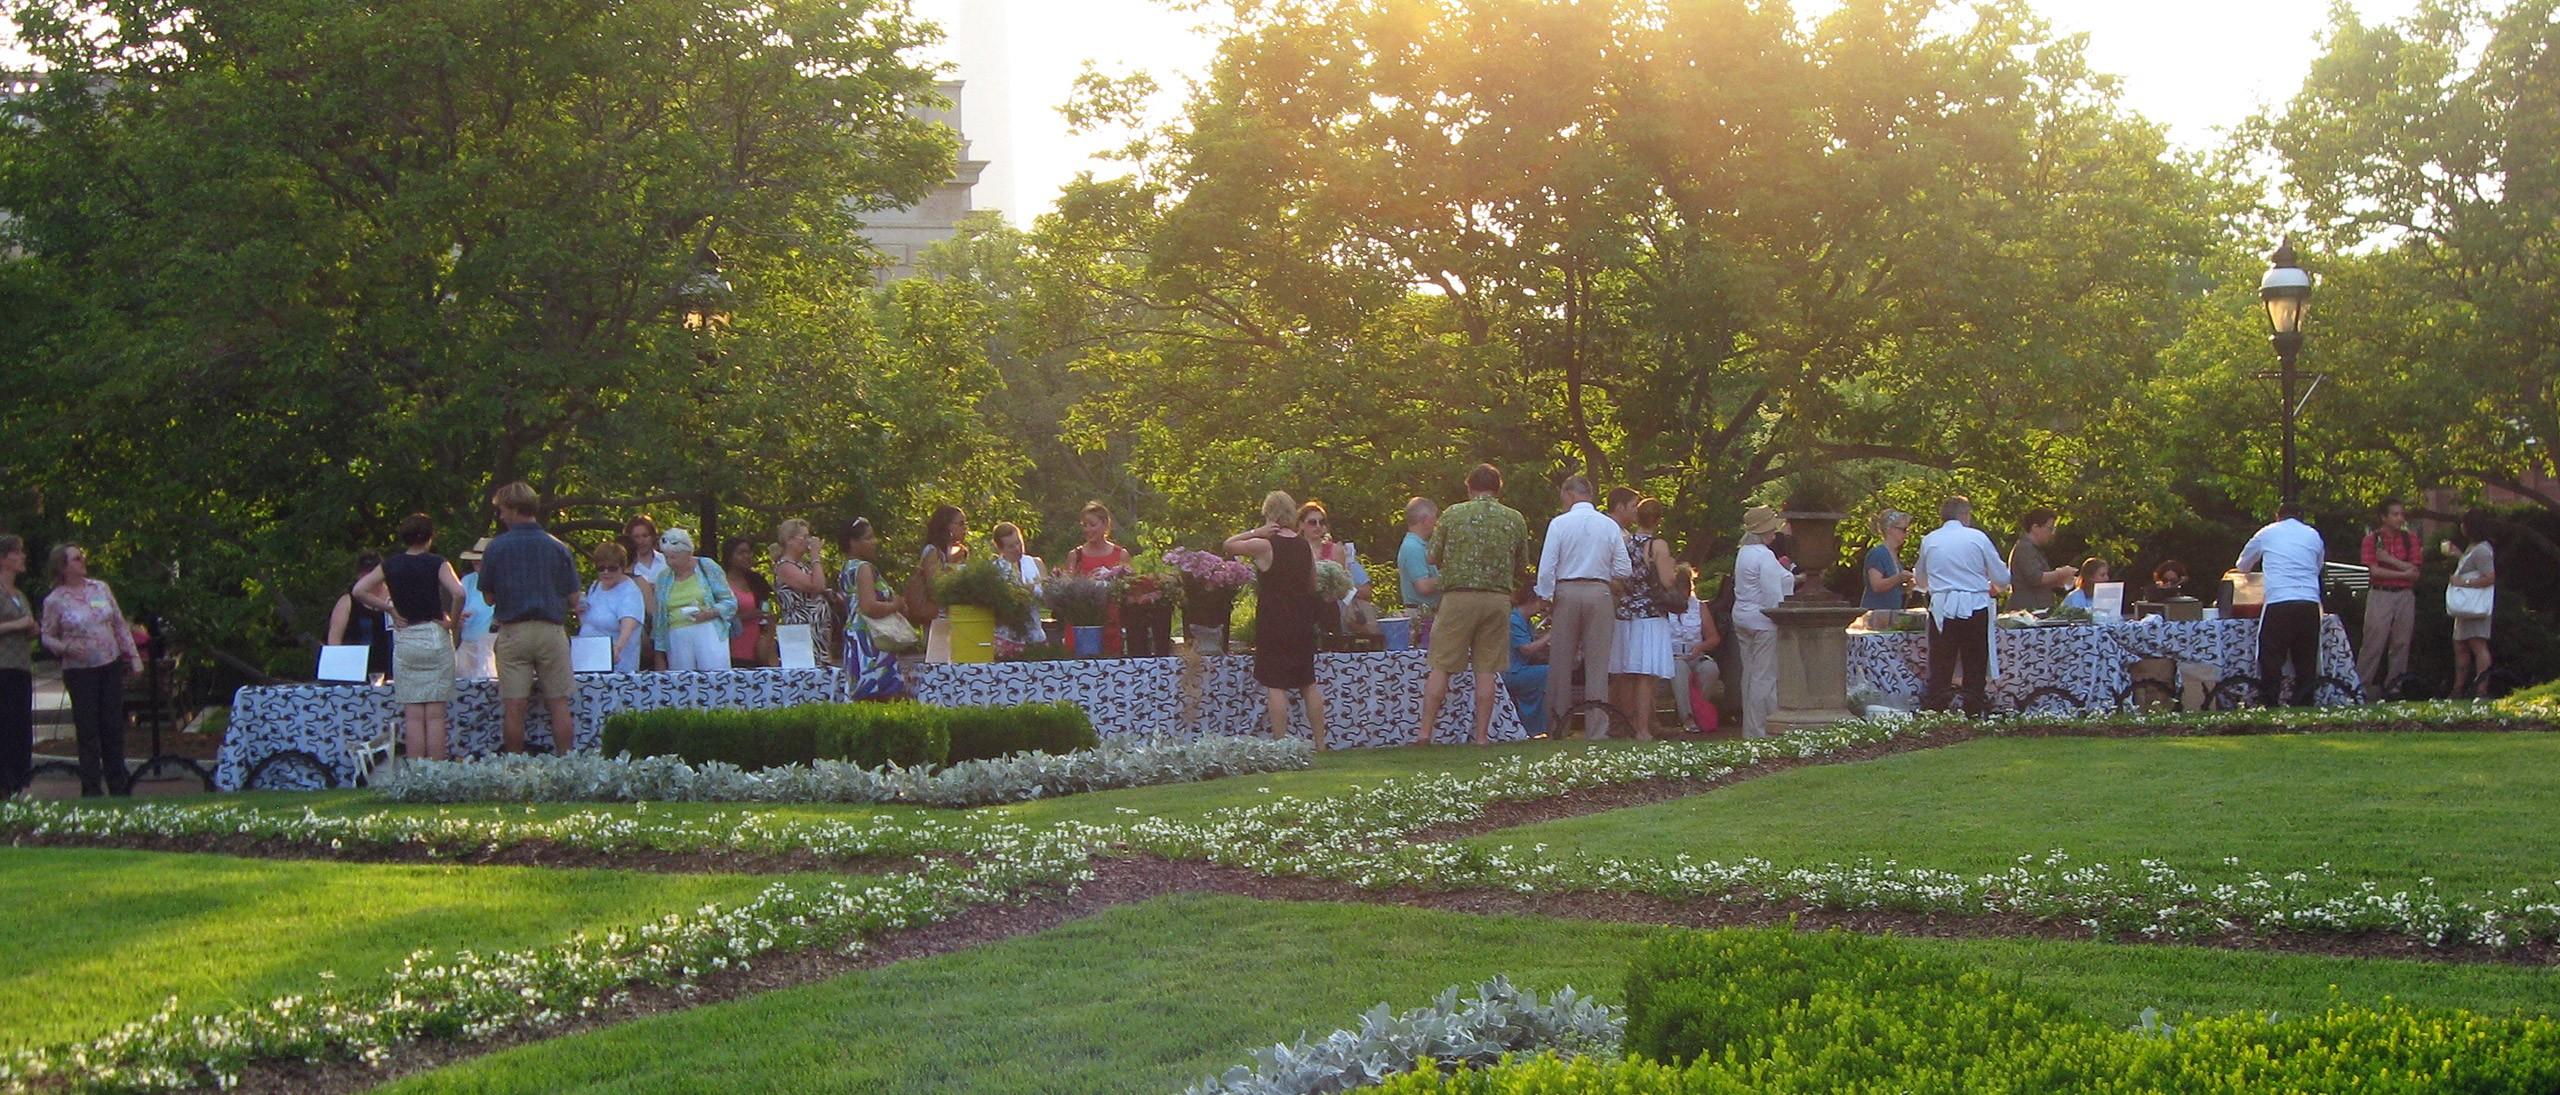 Guests enjoy activities & cocktails in the Enid A. Haupt Garden